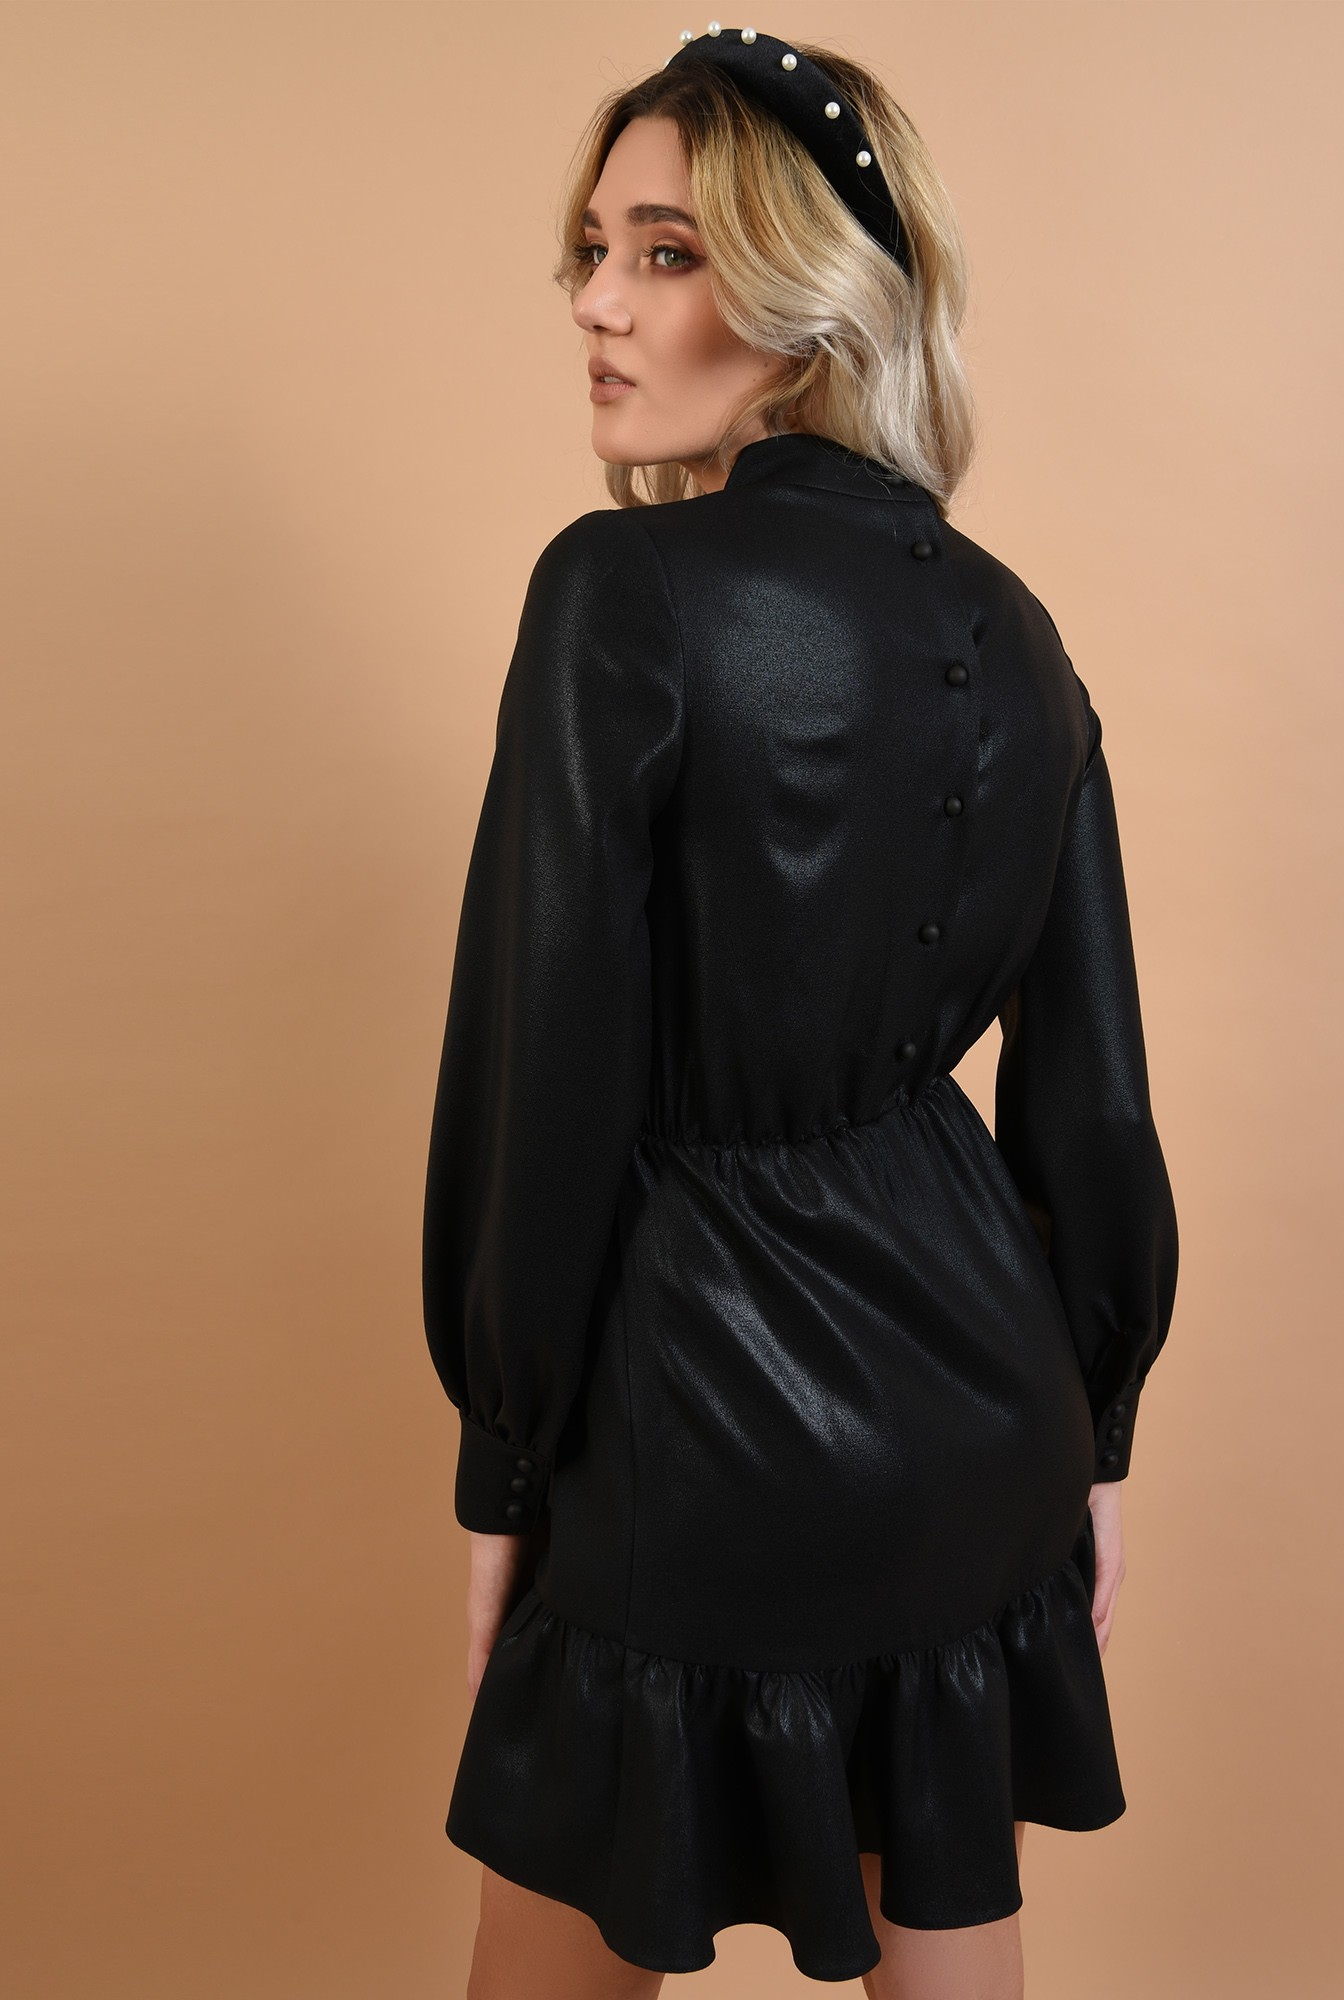 1 - 360 - rochie neagra, de ocazie, croi petrecut, nasturi la spate, Poema